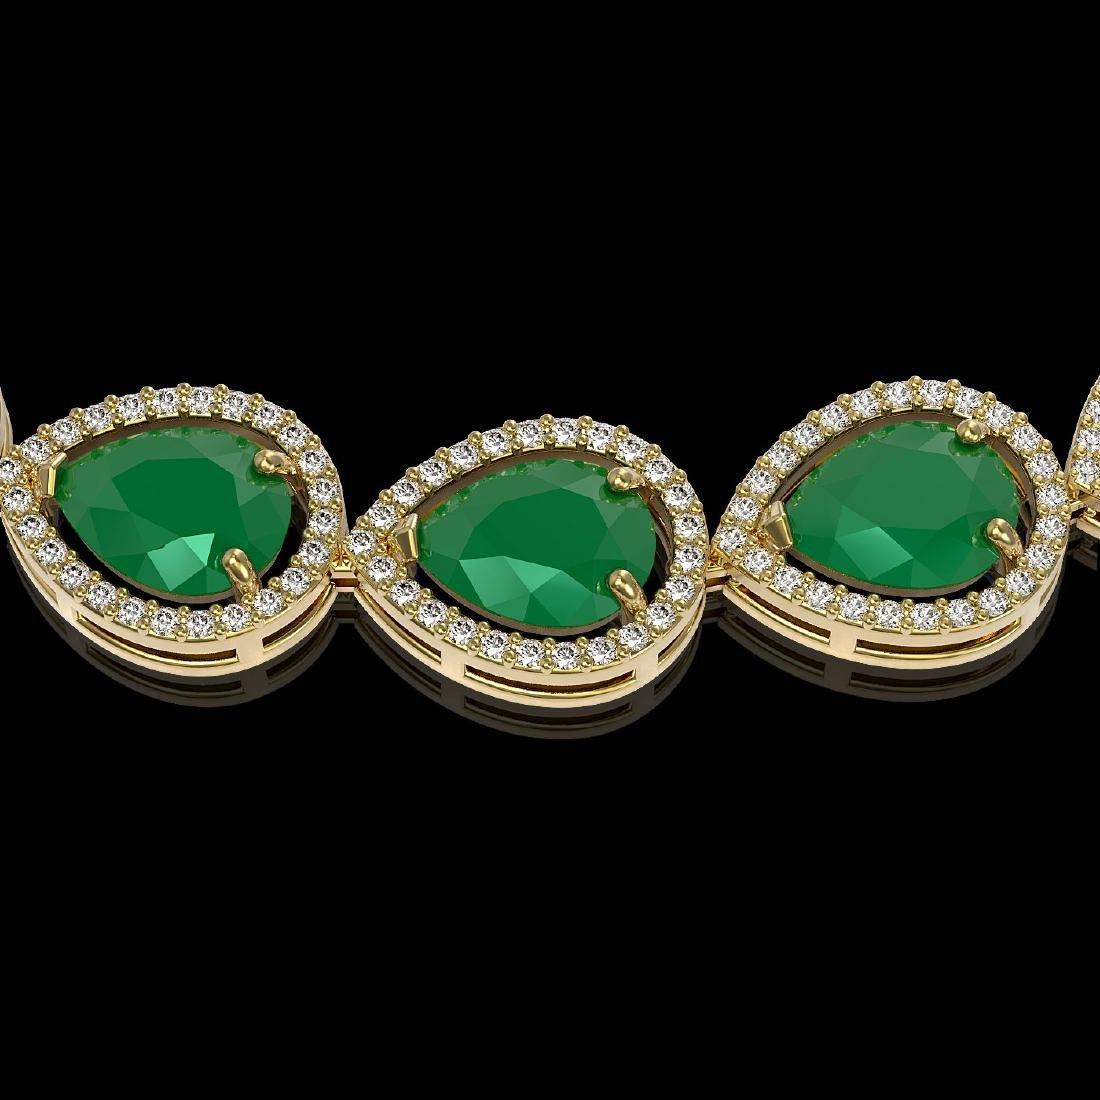 64.01 CTW Emerald & Diamond Halo Necklace 10K Yellow - 3